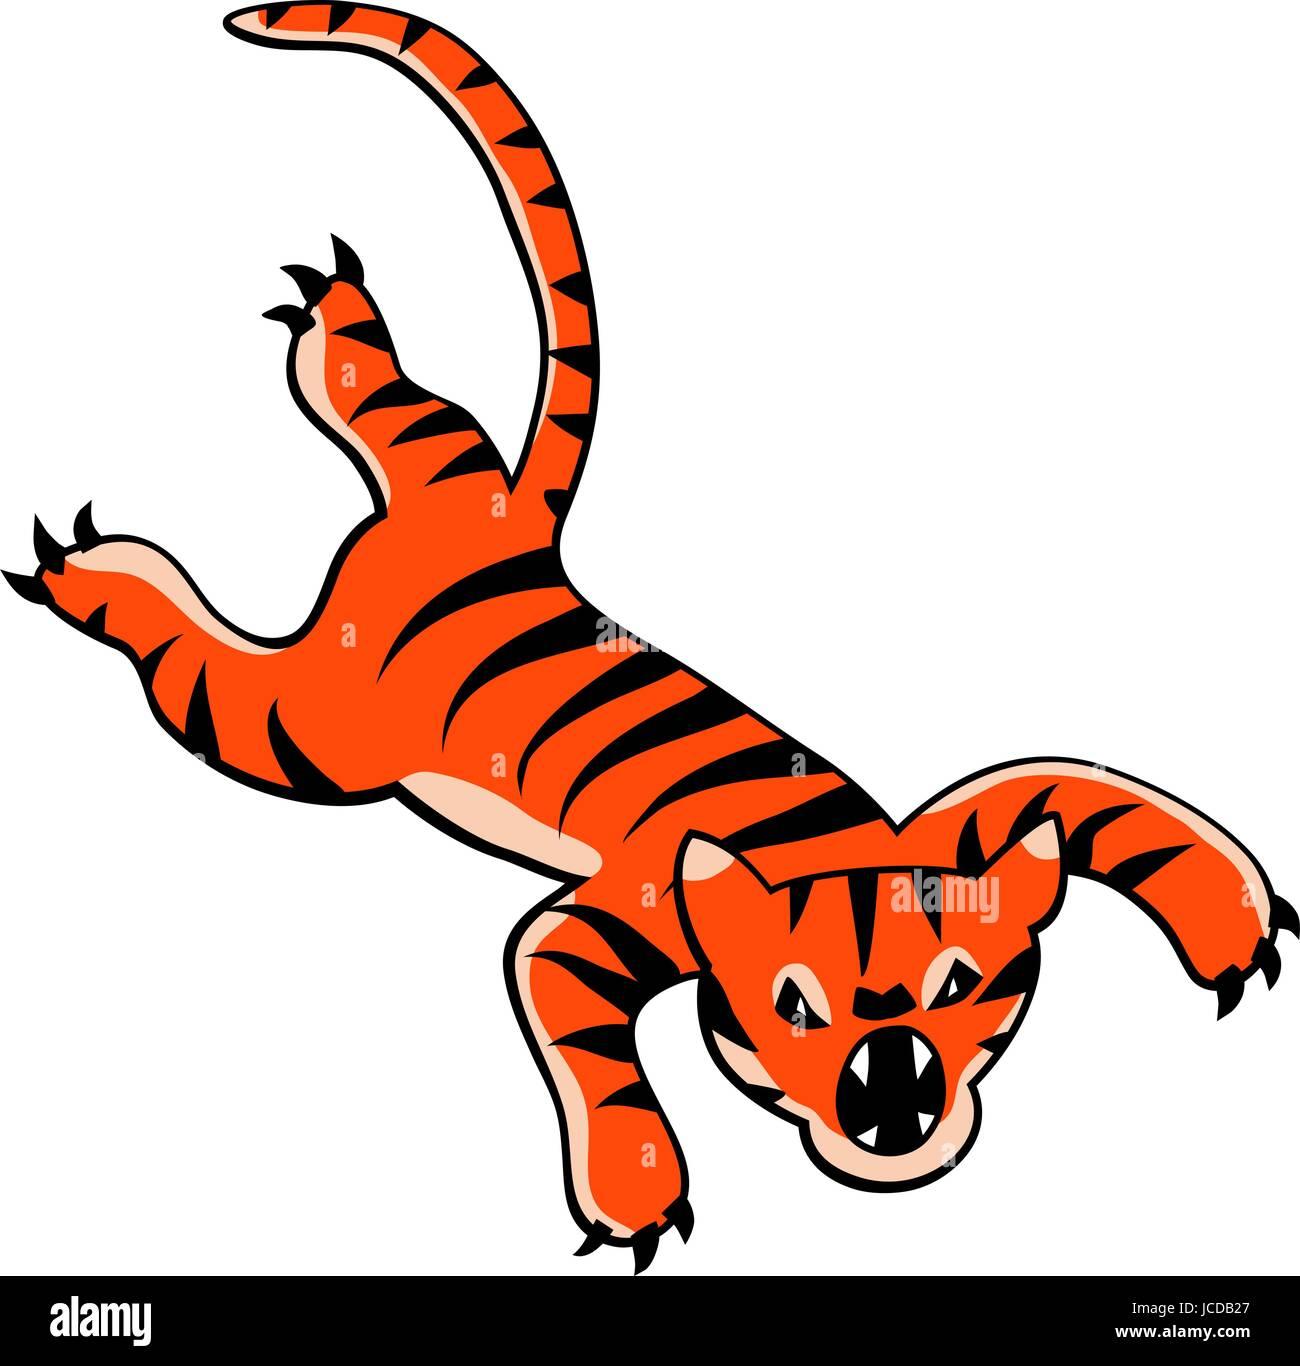 Cartoon vectorial editable de un tigre feroz saltando Imagen De Stock